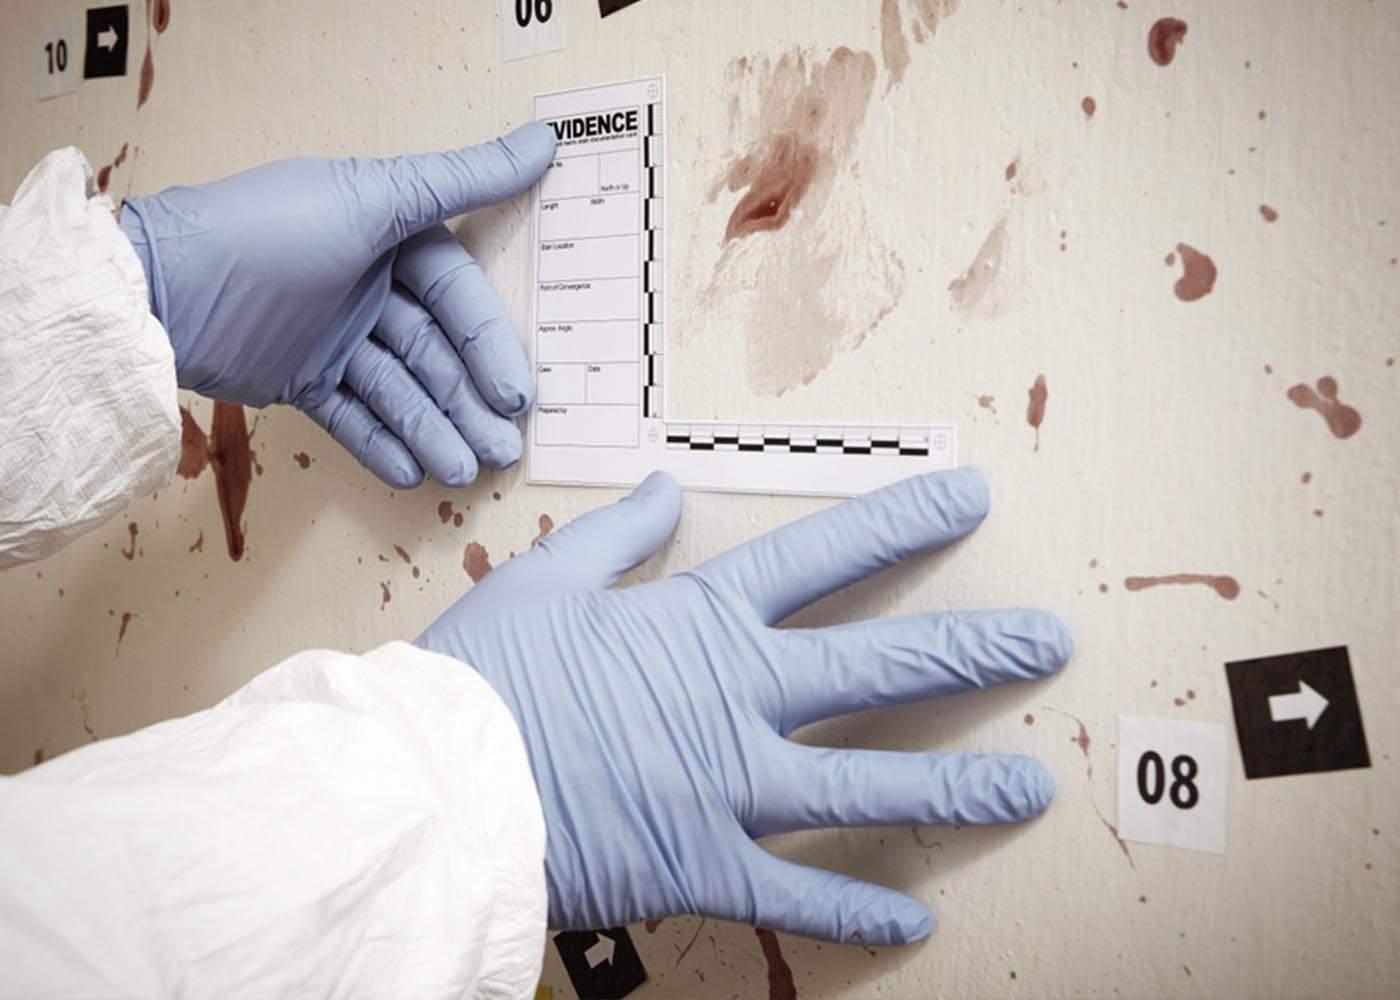 Study Forensics at William Peace University